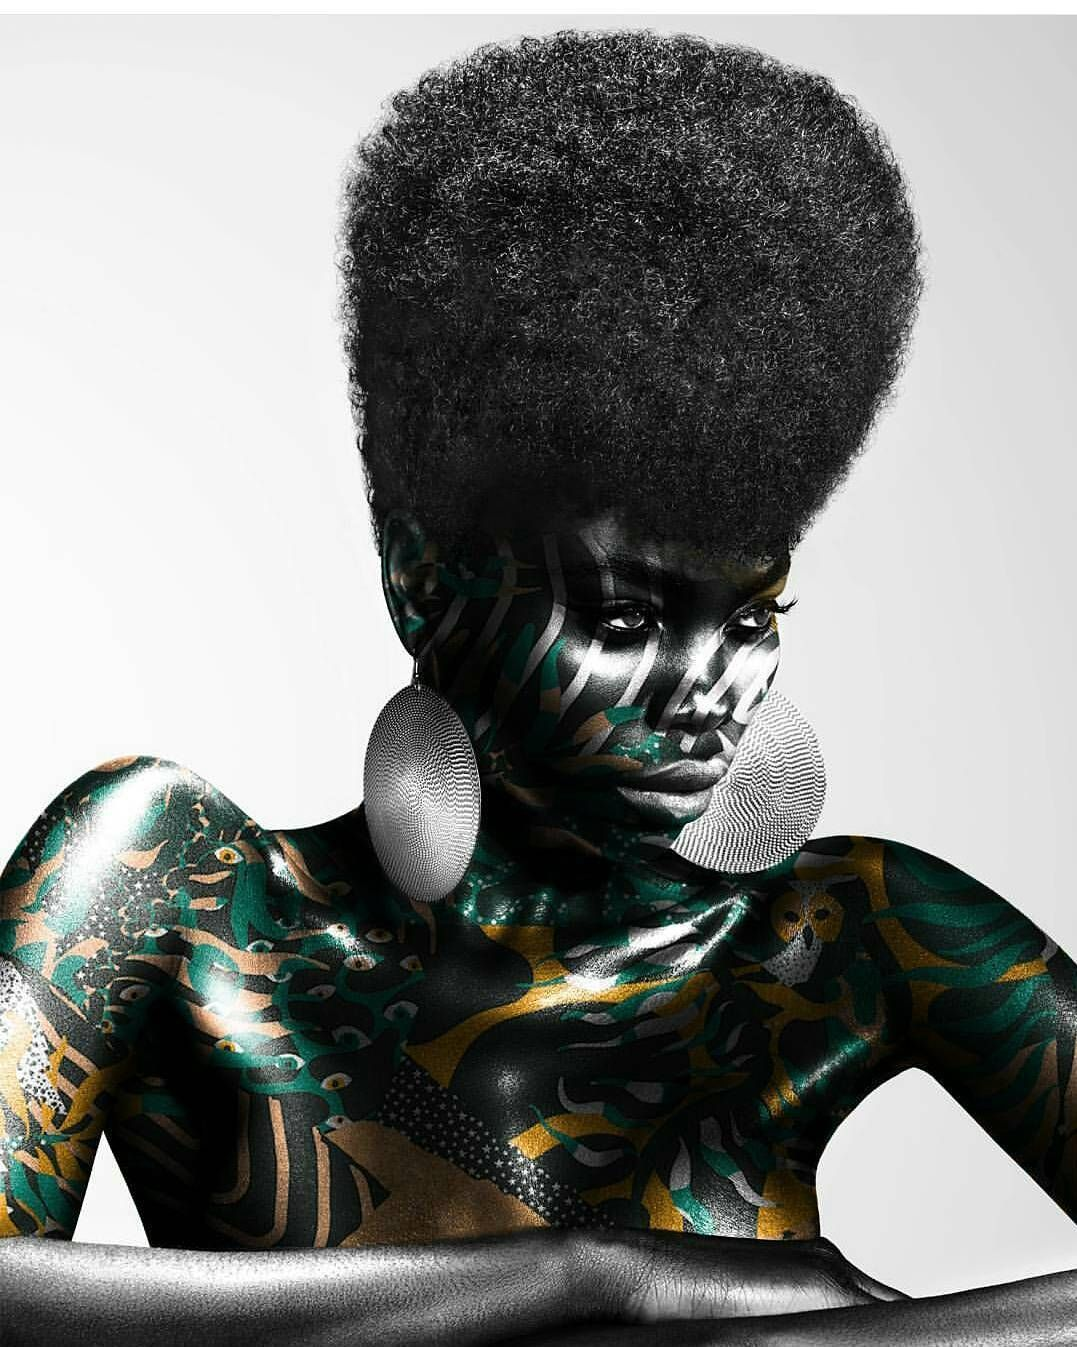 Under my skin 02. : @johnrawson Image via @pasteinplace_ —— #Osengwa | #AfricanArt | #AfricanFashion | #AfricanMusic | #AfricanStyle | #AfricanPhotography | #Afrocentric | #Melanin | #African | #Art...